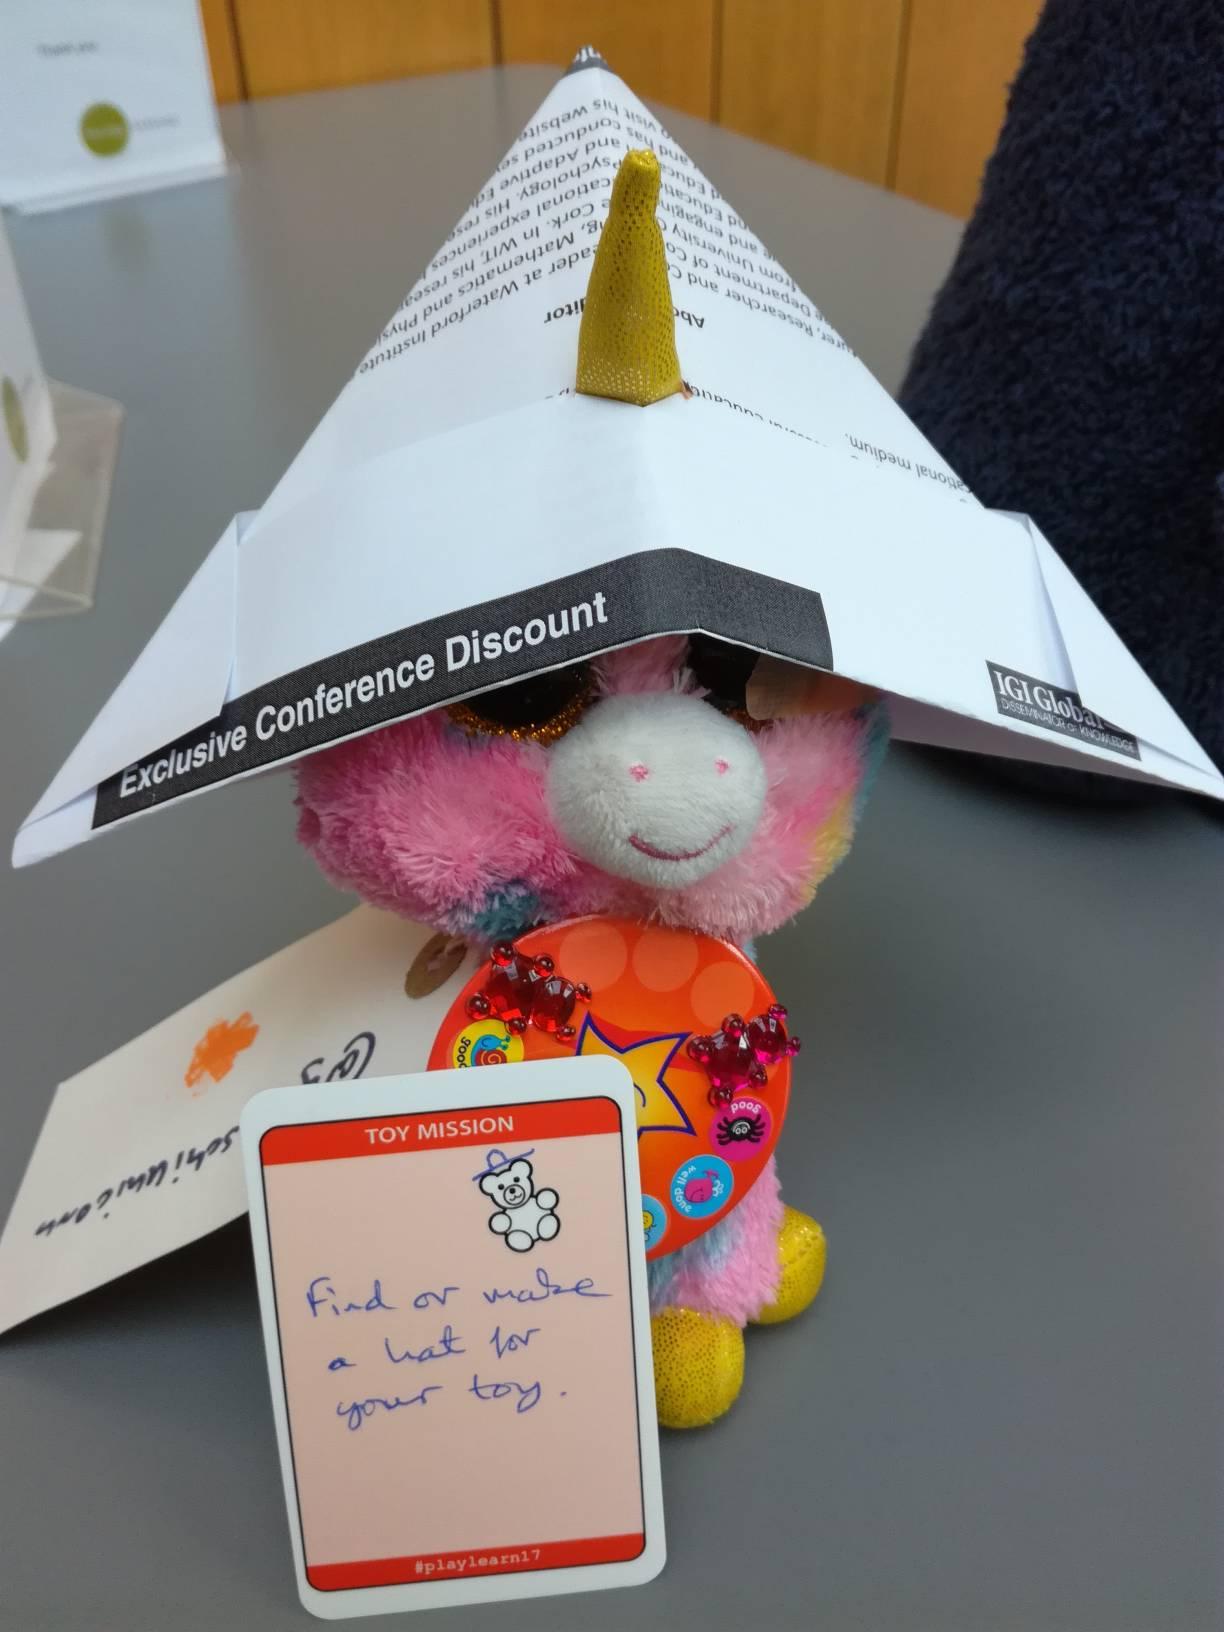 #playlearn17 unicorn hat (R) https://t.co/KIqe7P66oq